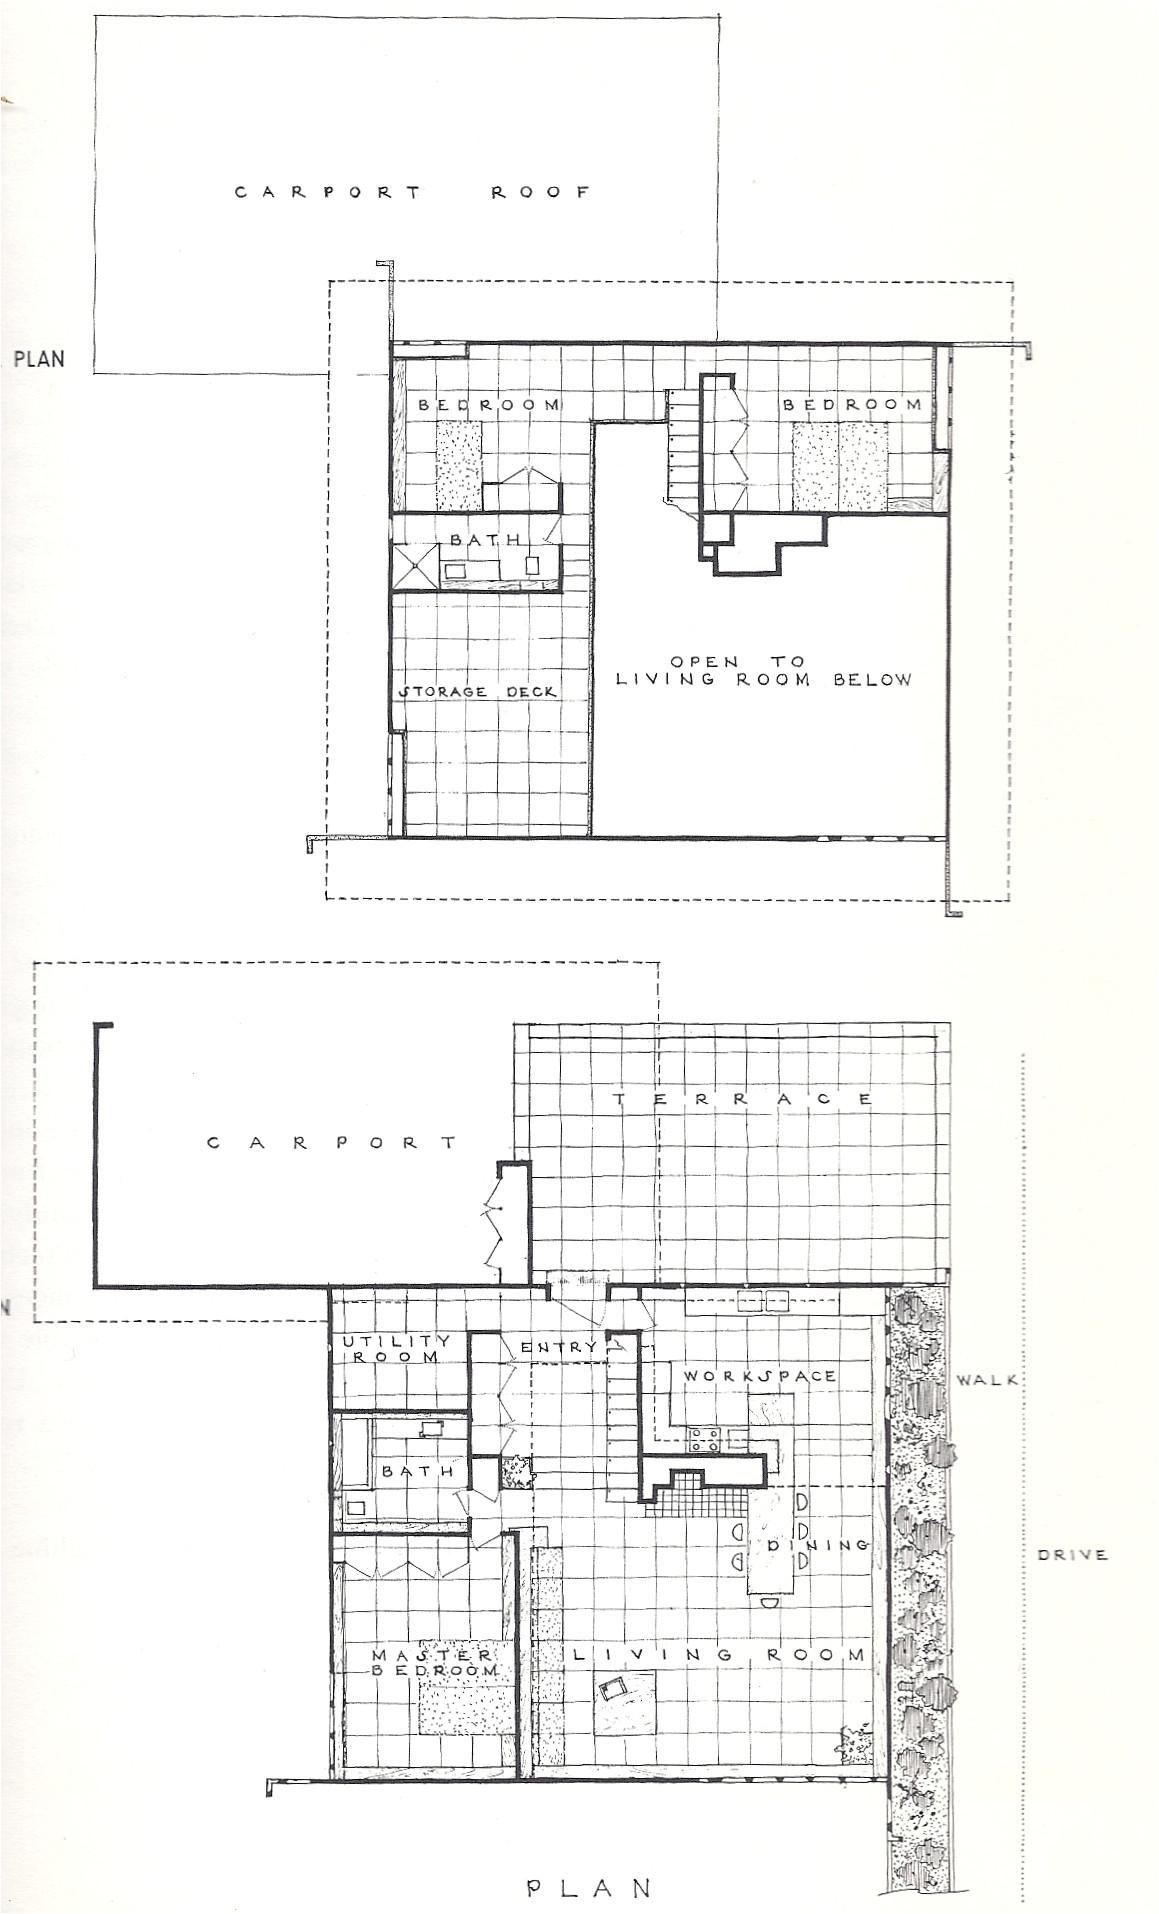 usonian housing project 1957